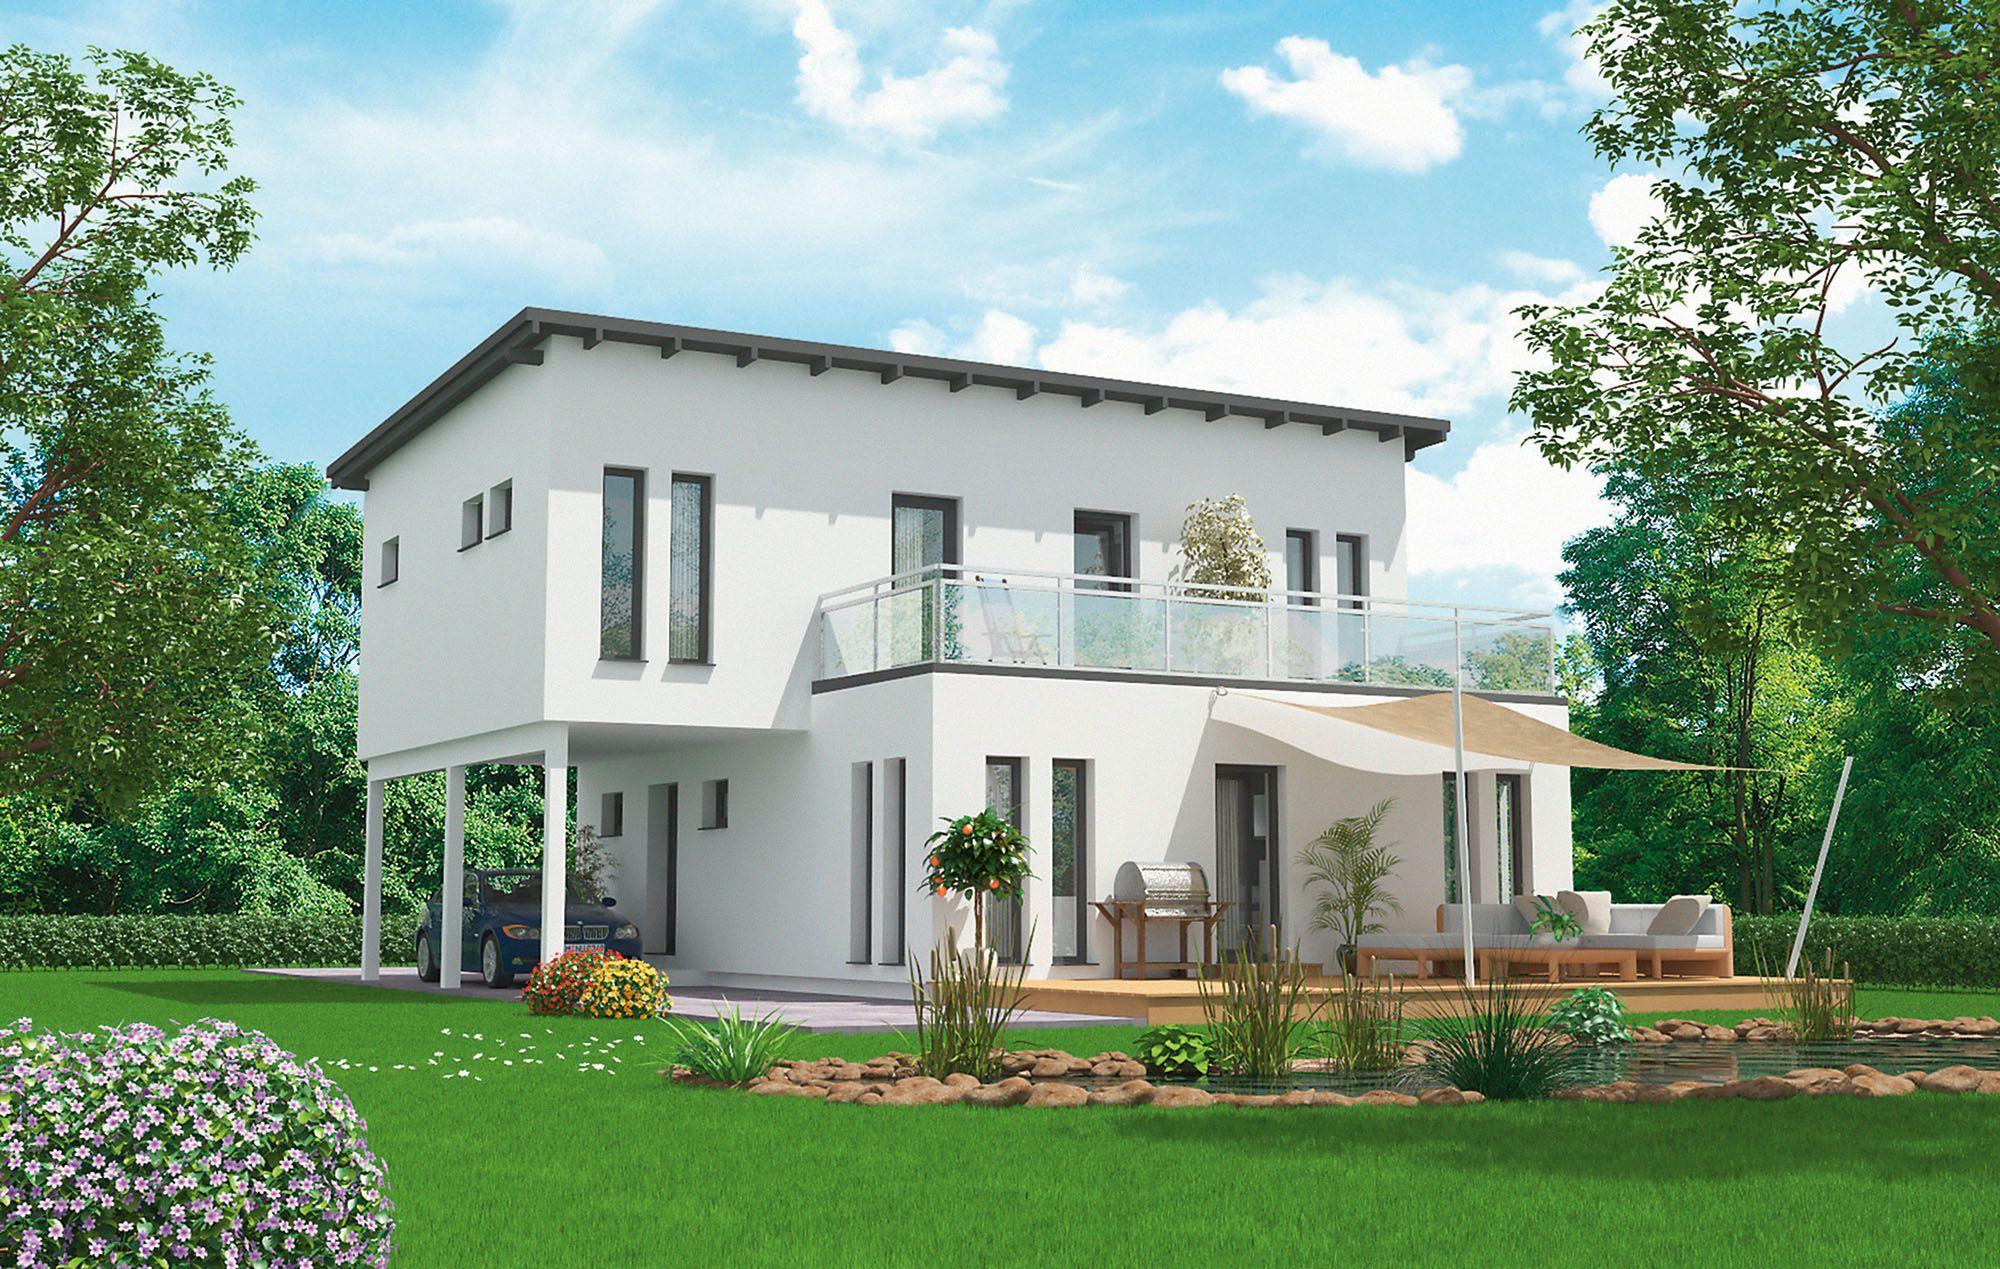 Fertighaus New Design II | VARIO-HAUS Fertigteilhäuser | Gibt dem ...